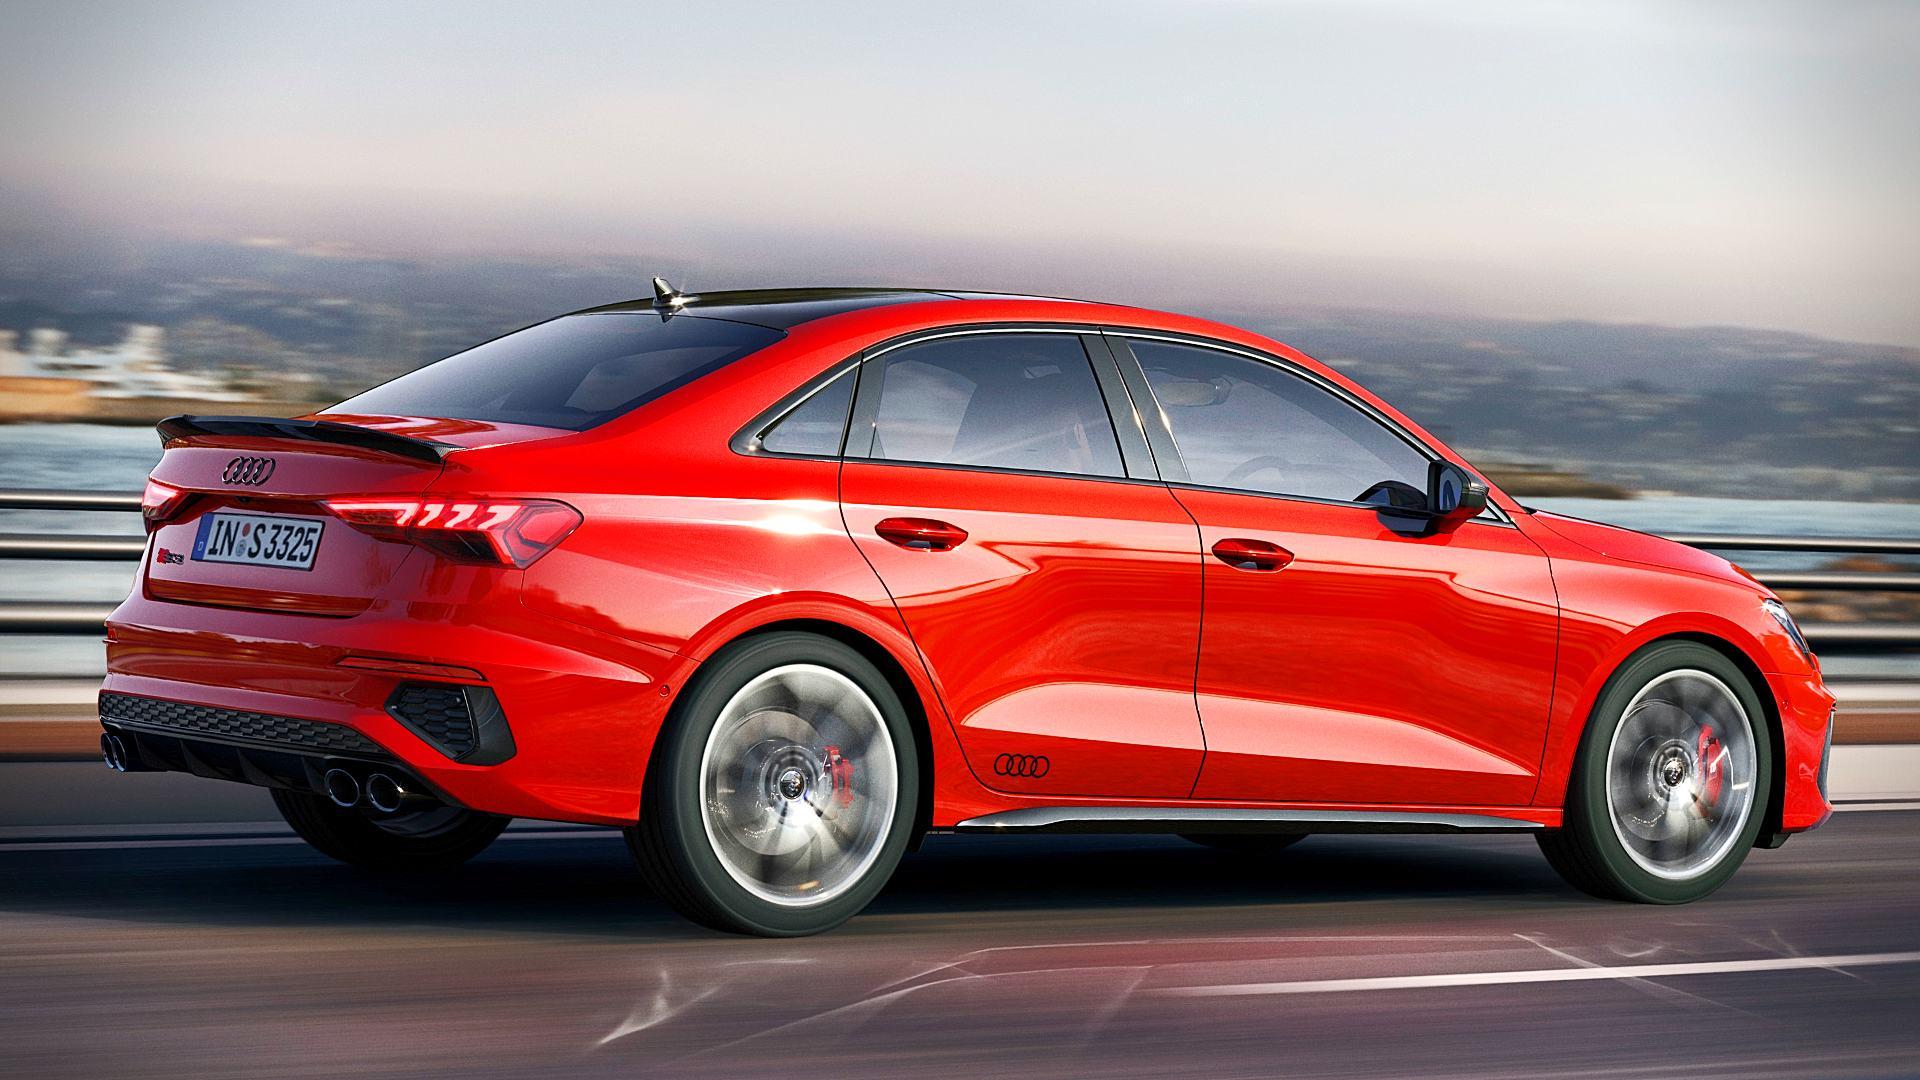 2021 Audi S3 Red Sedan Photos